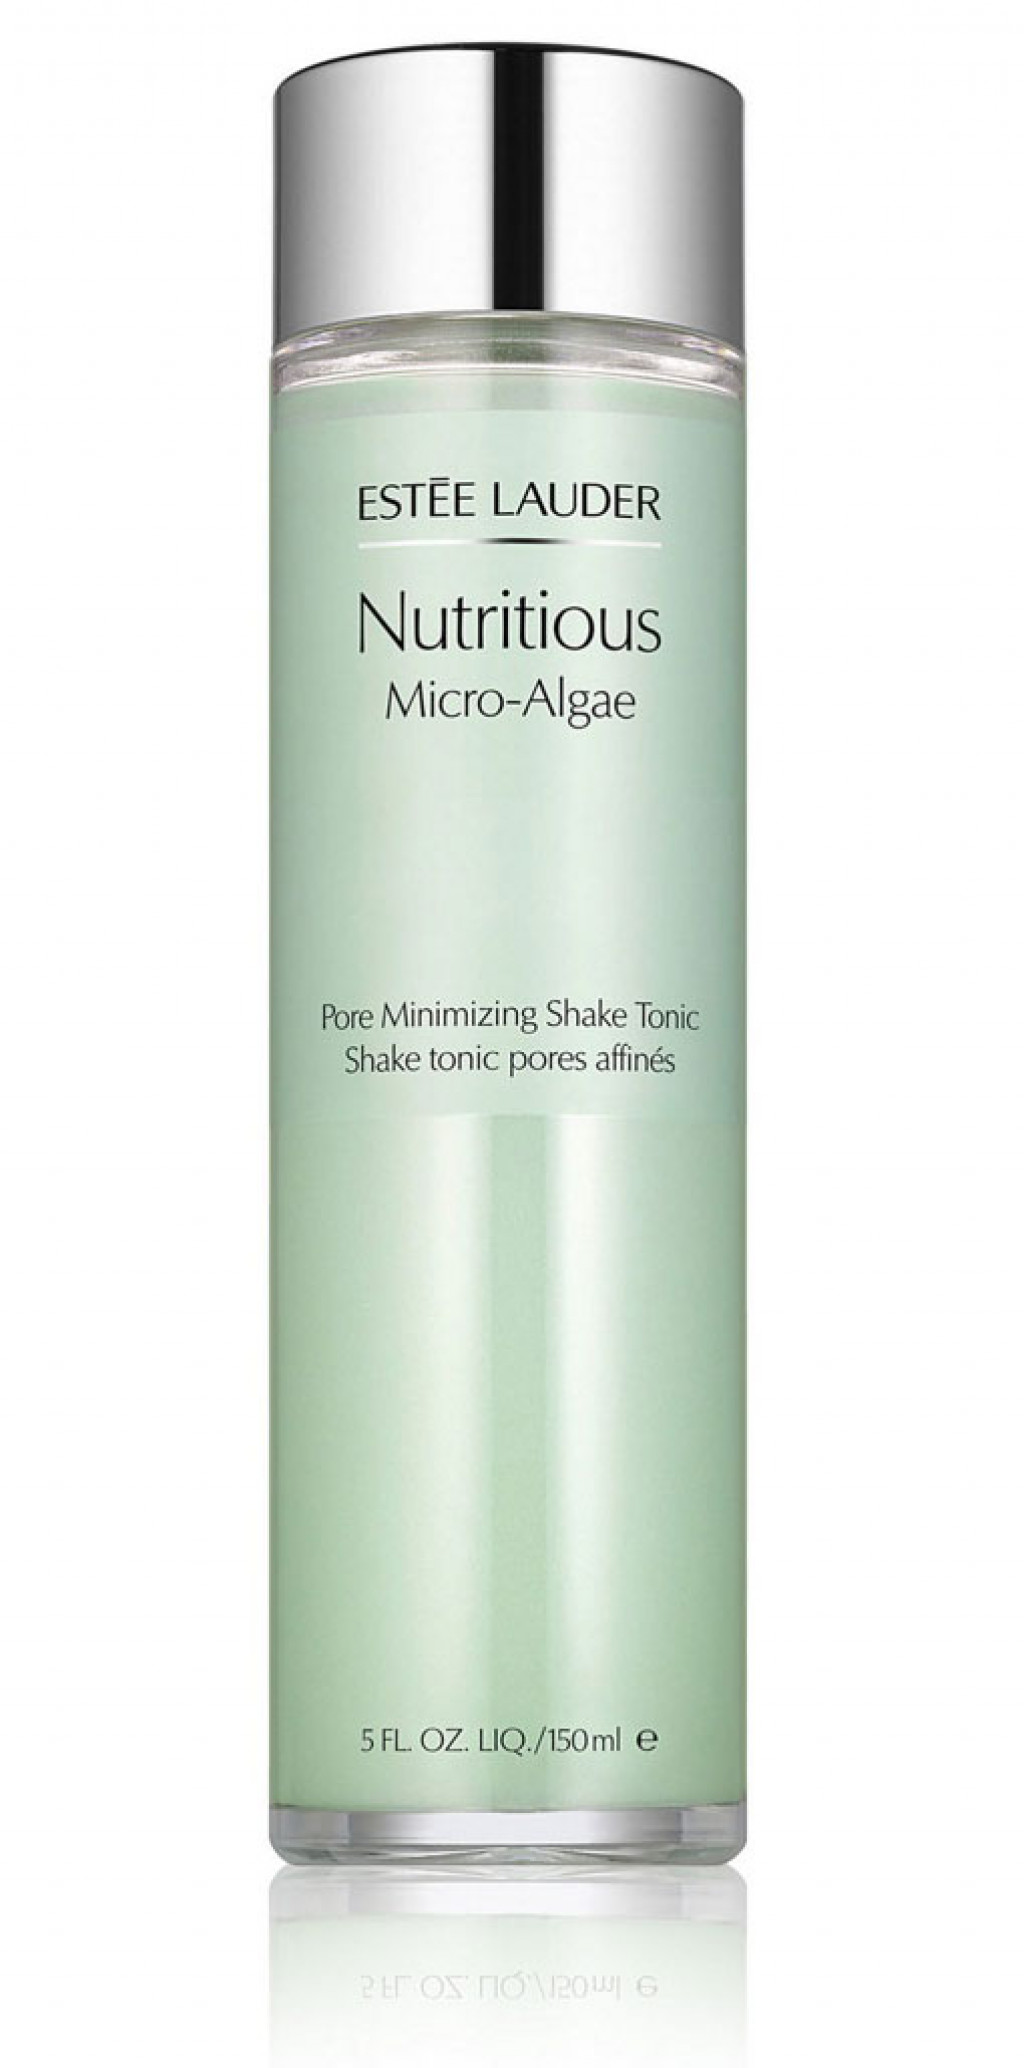 Est 233 E Lauder Nutritious Micro Algae Pore Minimizing Shake